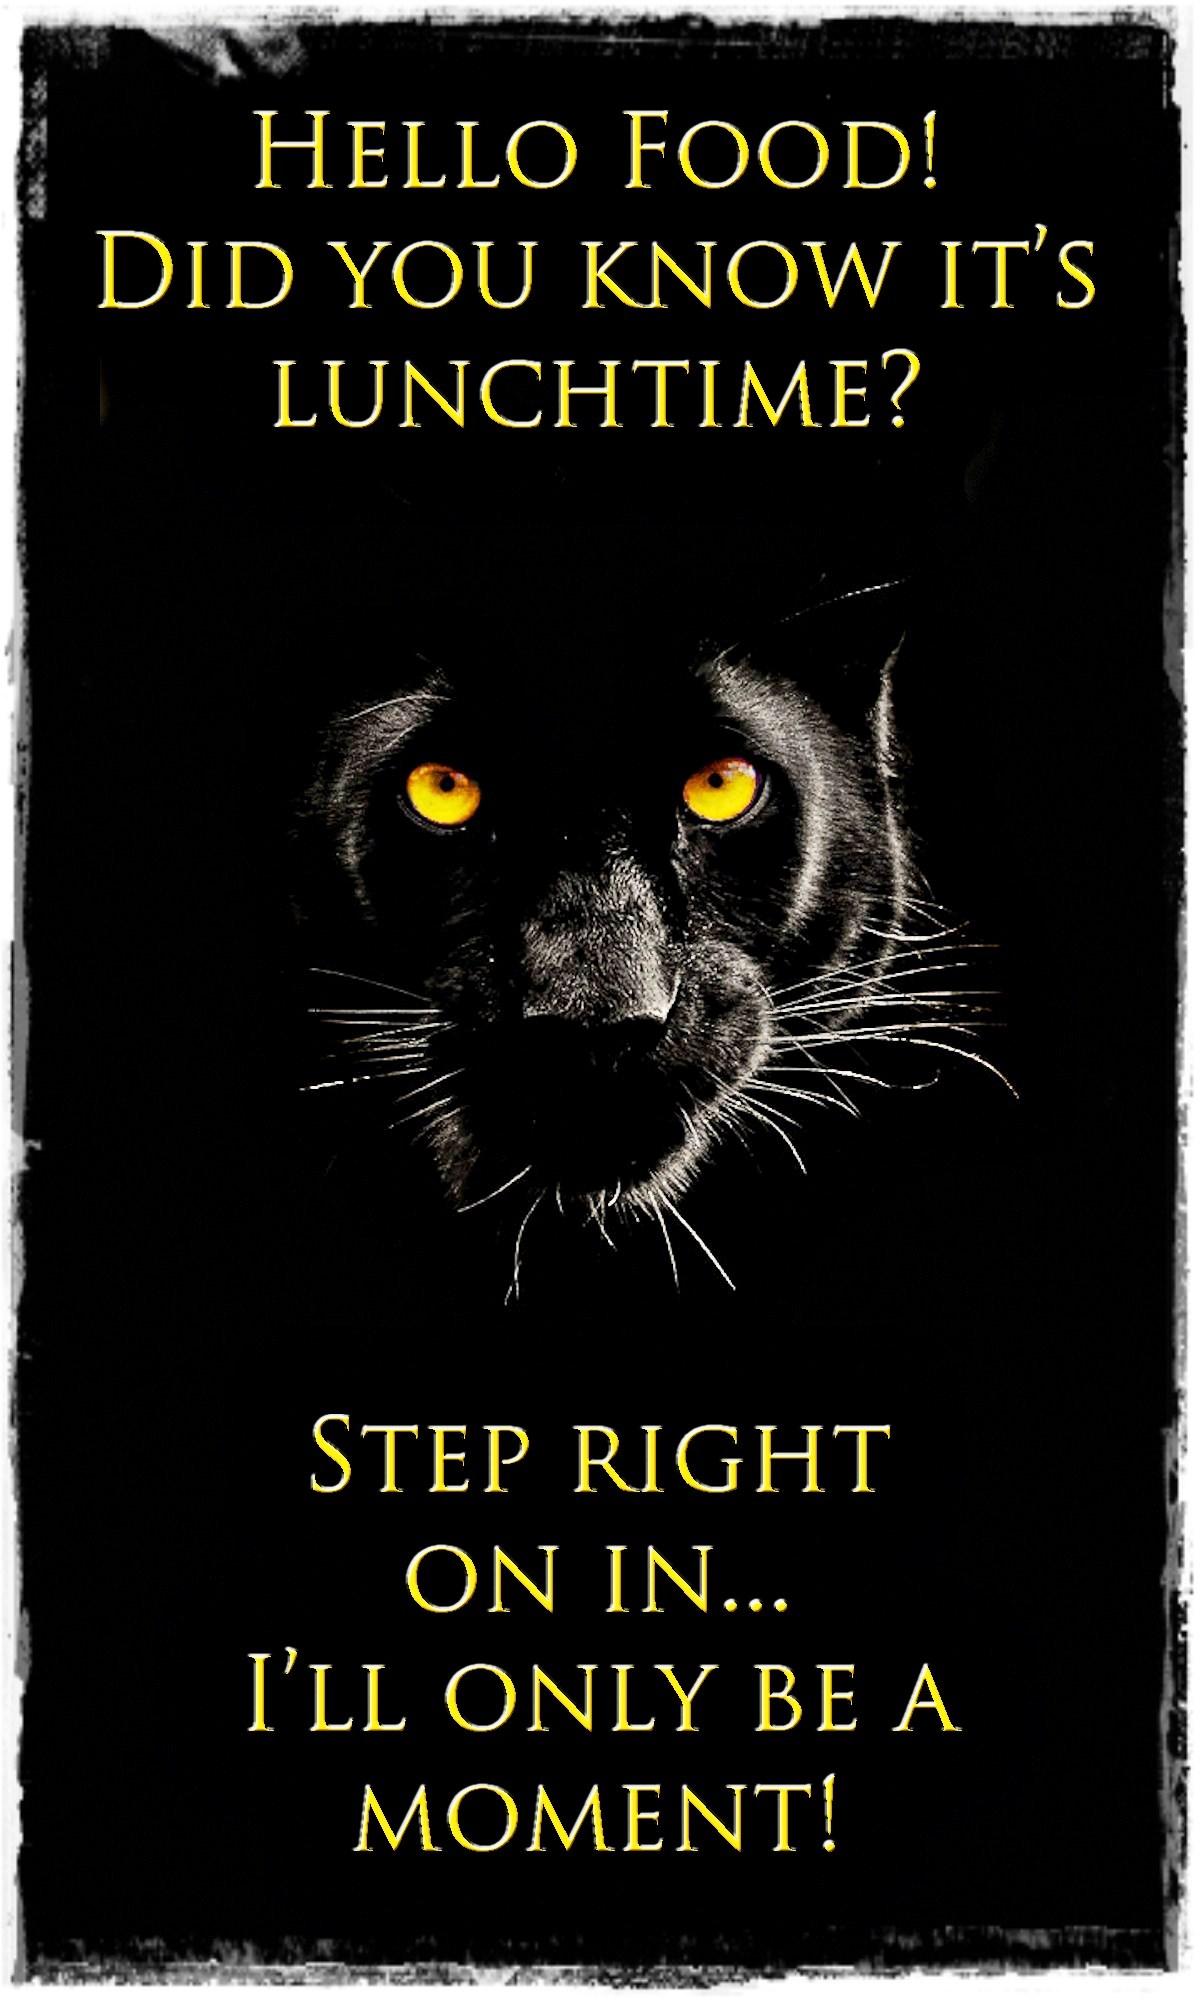 00 black jaguar 220815